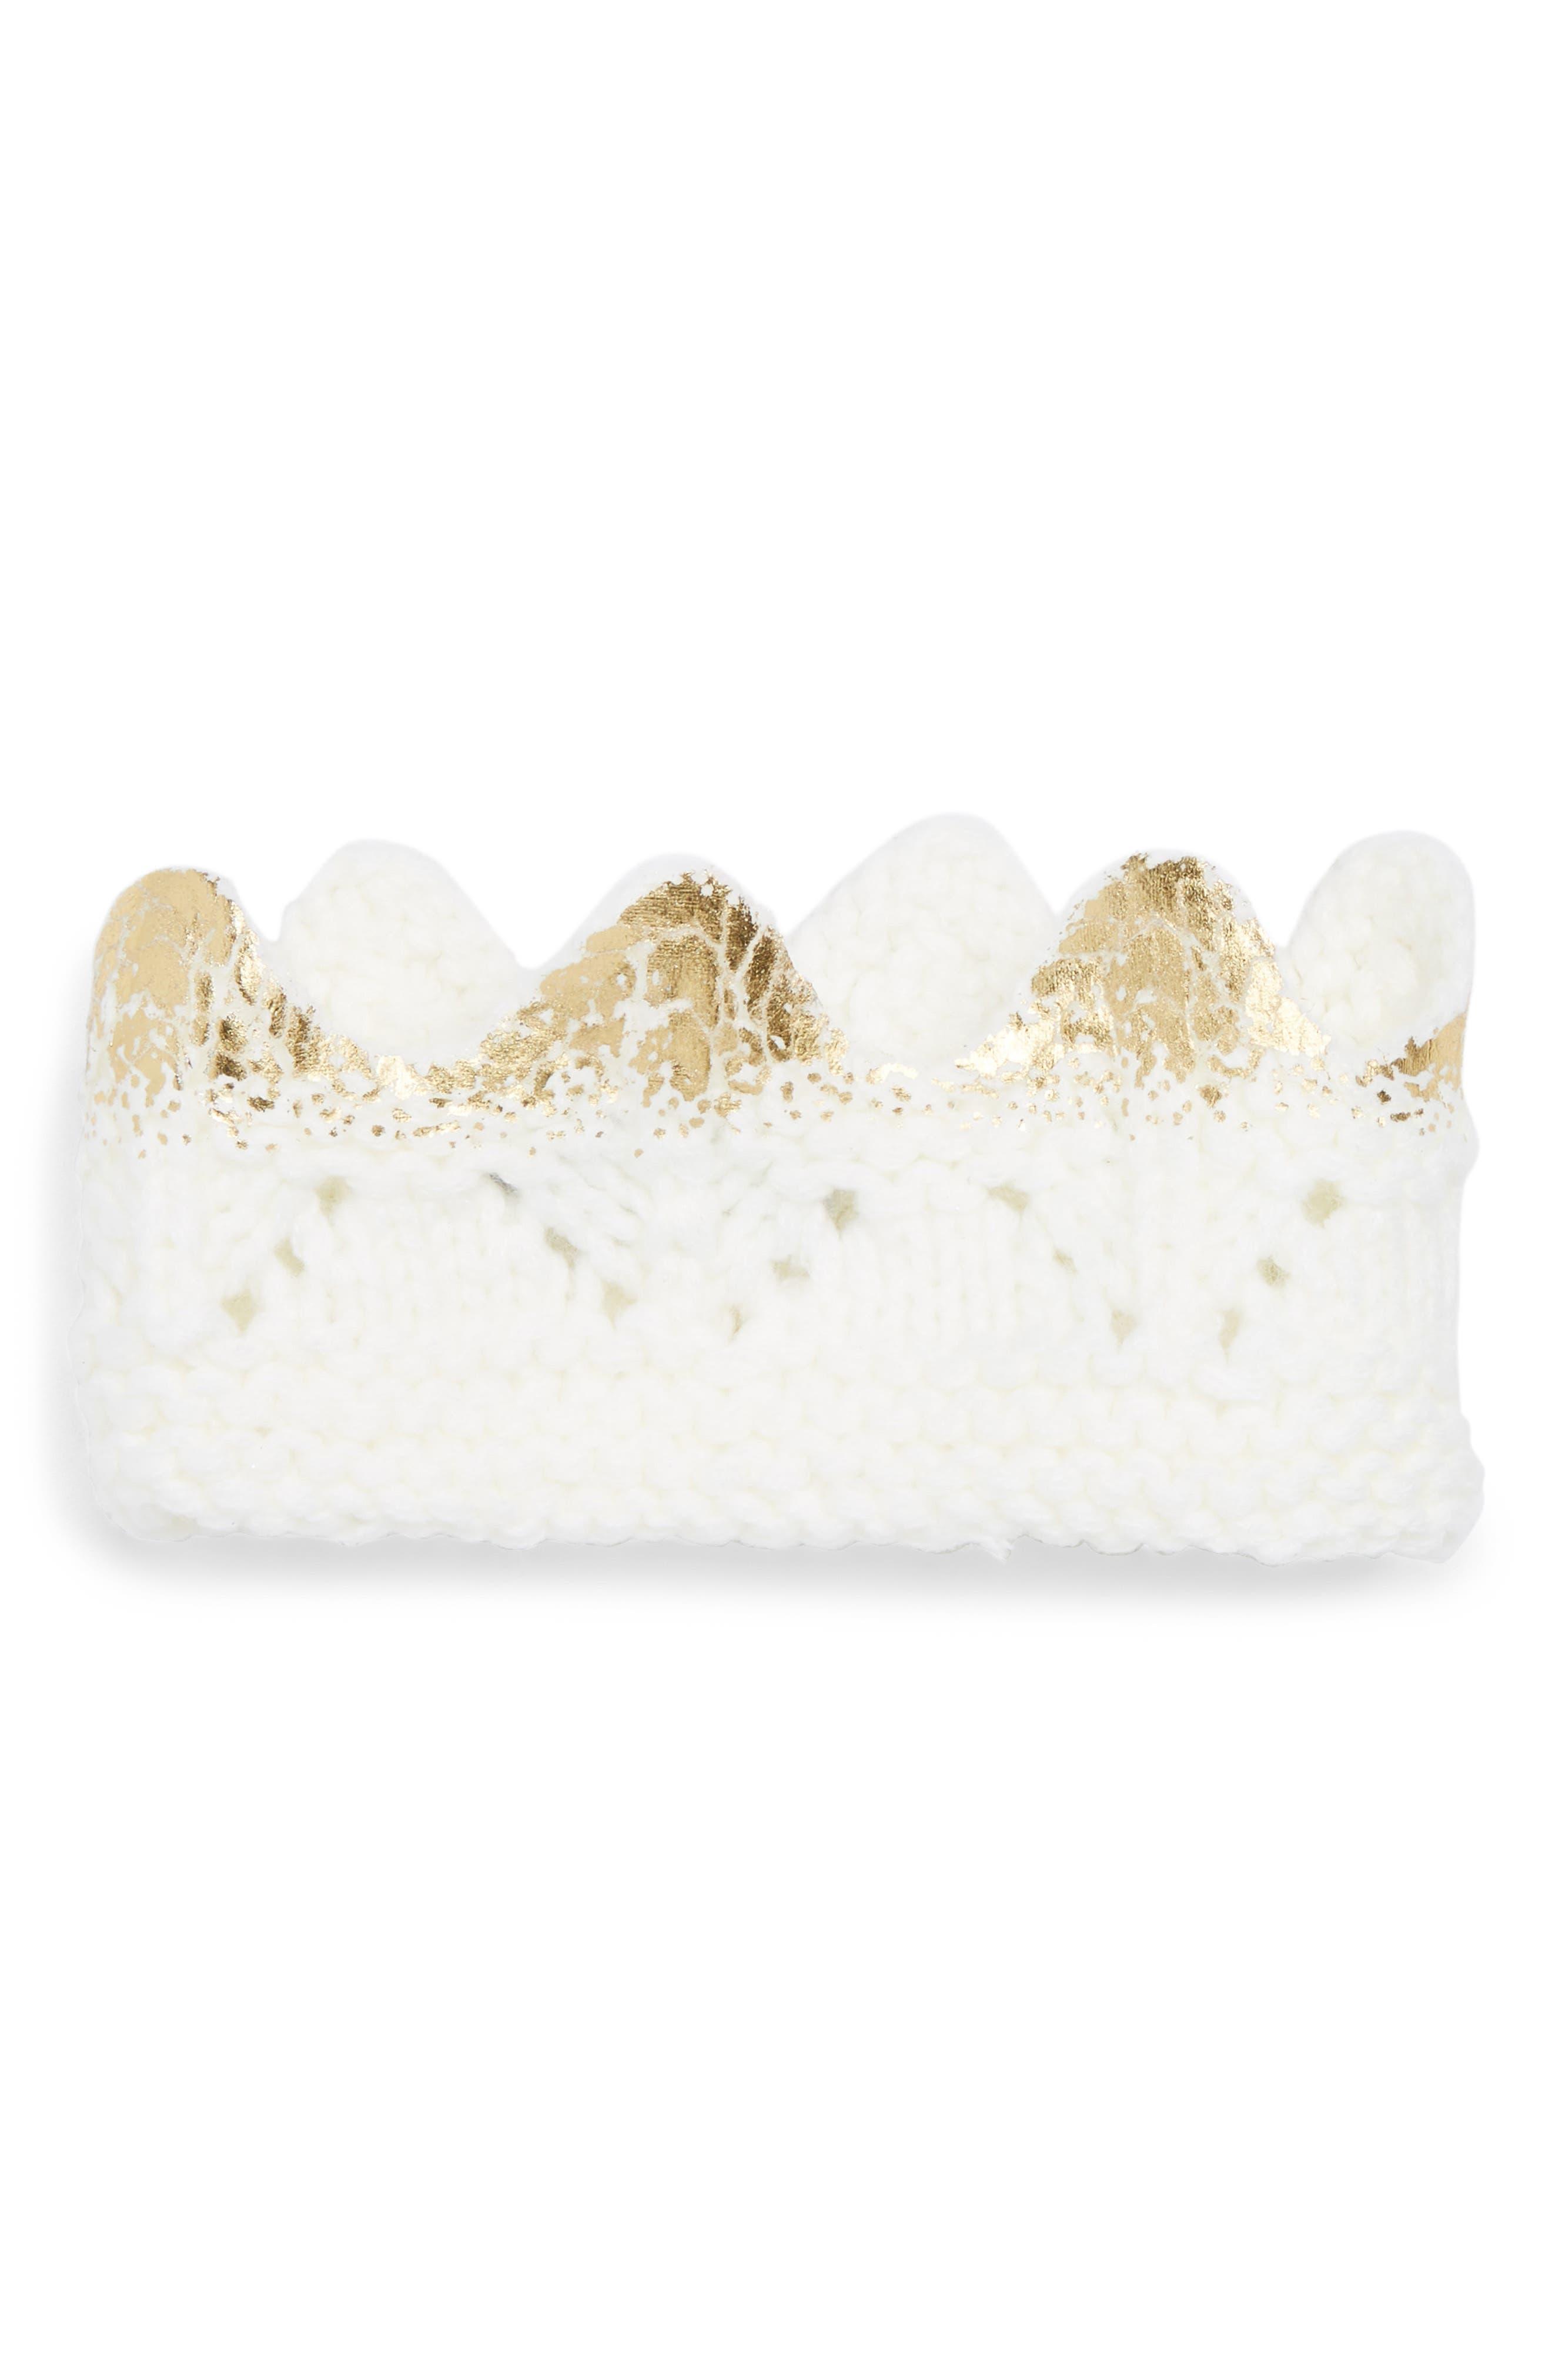 Aiden Knit Crown,                         Main,                         color, 902